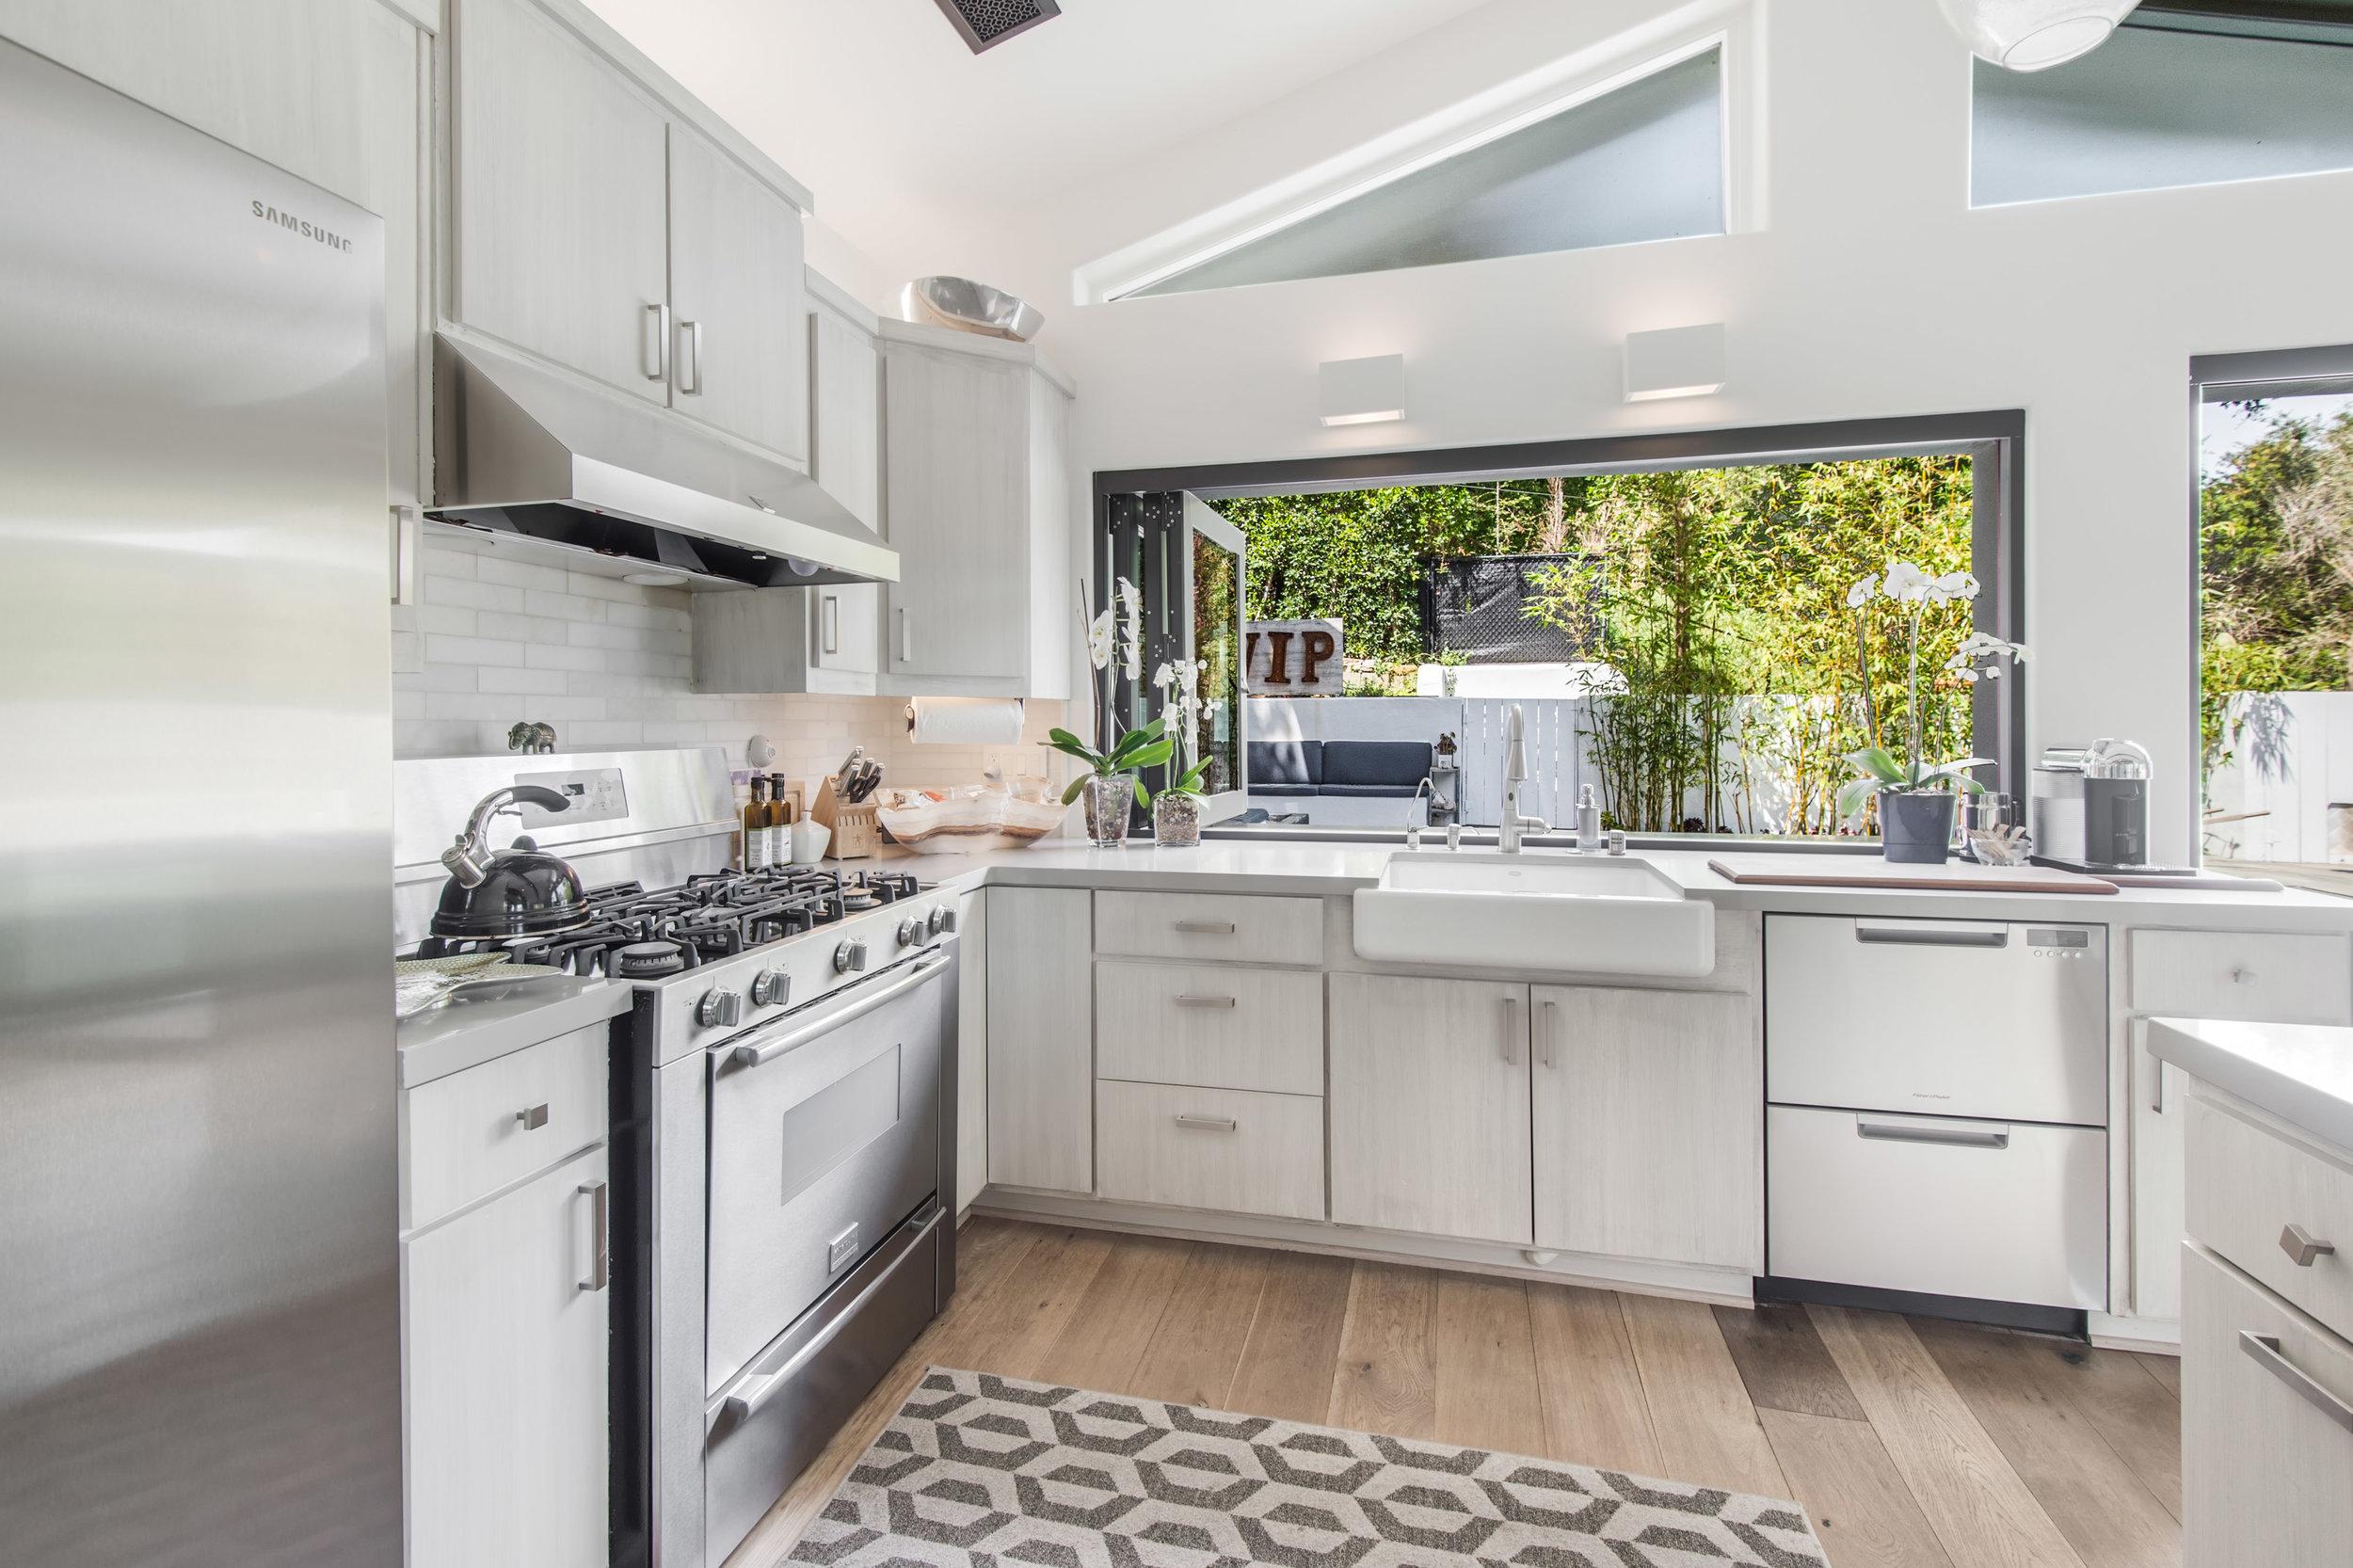 013 Kitchen 26272 Cool Glen Way Malibu For Sale Luxury Real Estate.jpg